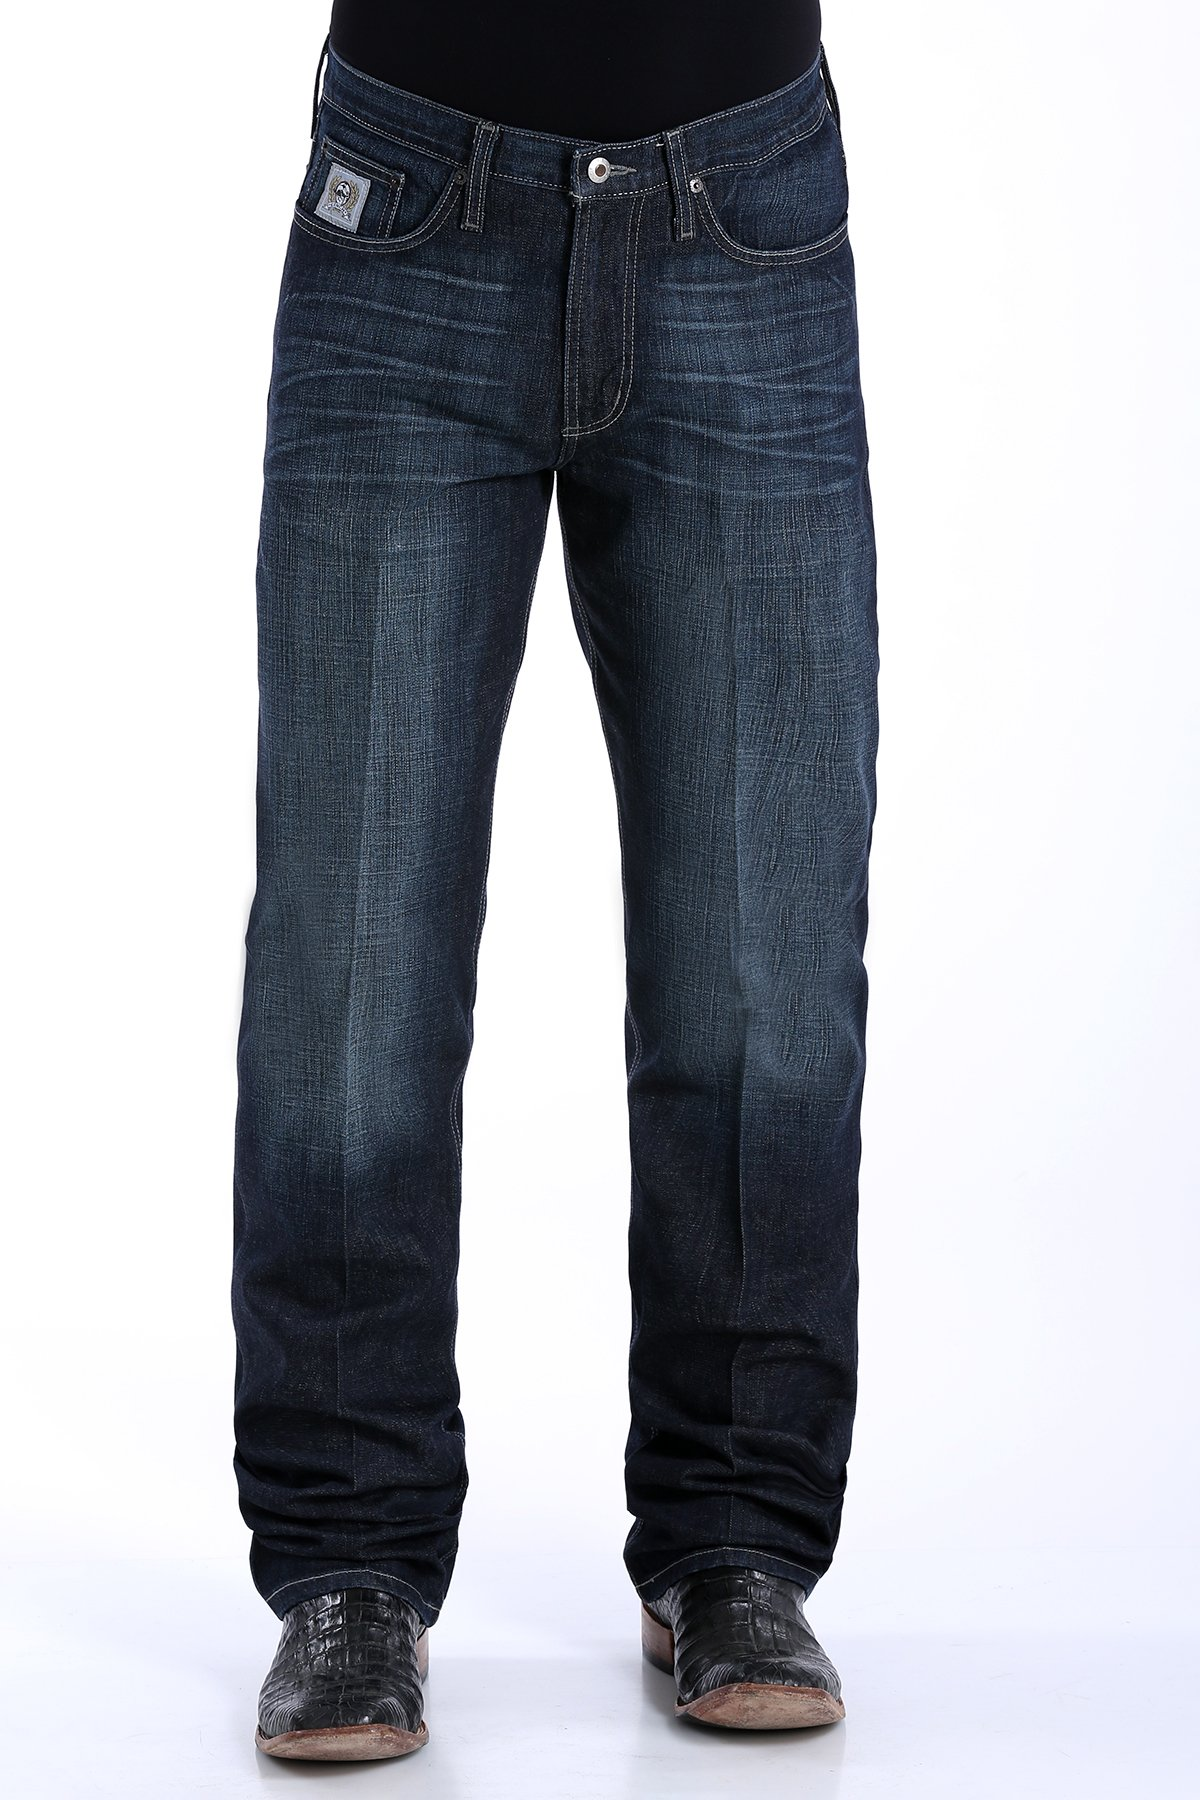 jeans-western-homme-silver-label-cinch(3)